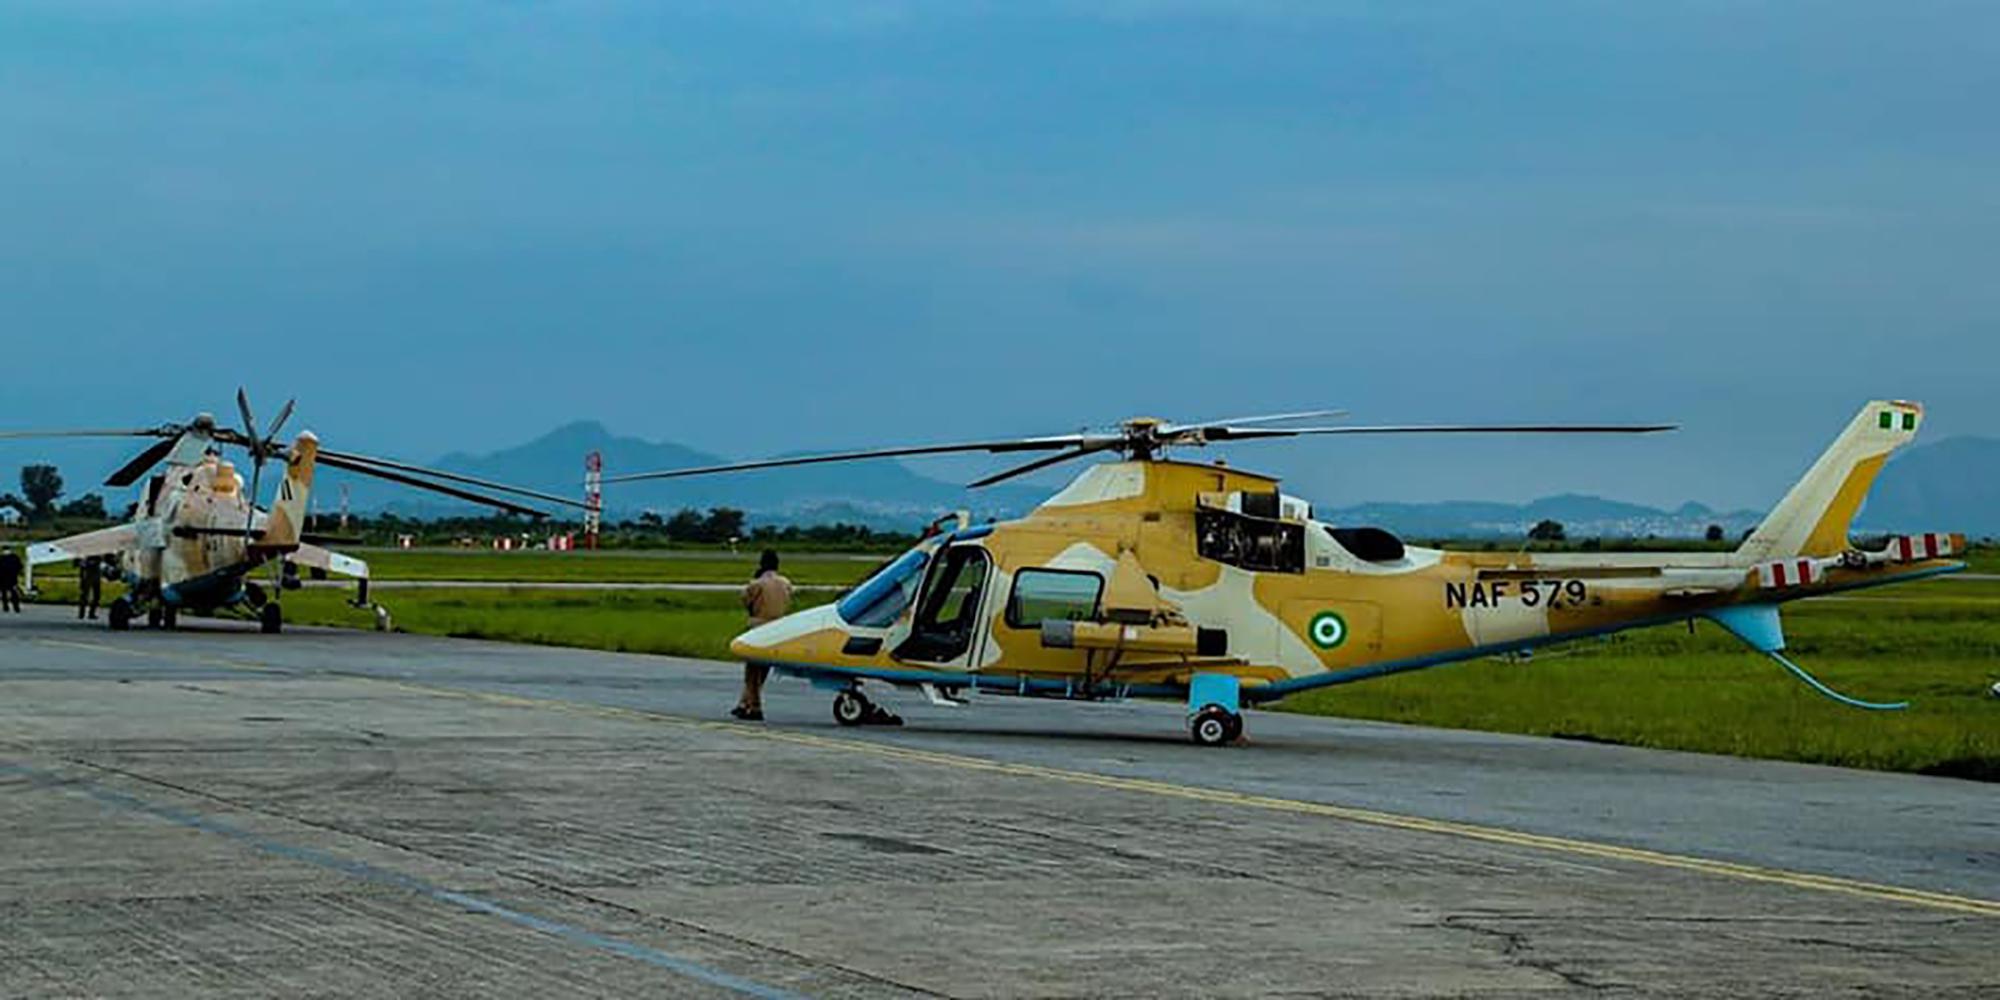 DECLASSIFIED UK: Helicopter attack on Nigerian civilians puts British pilot training under fresh scrutiny